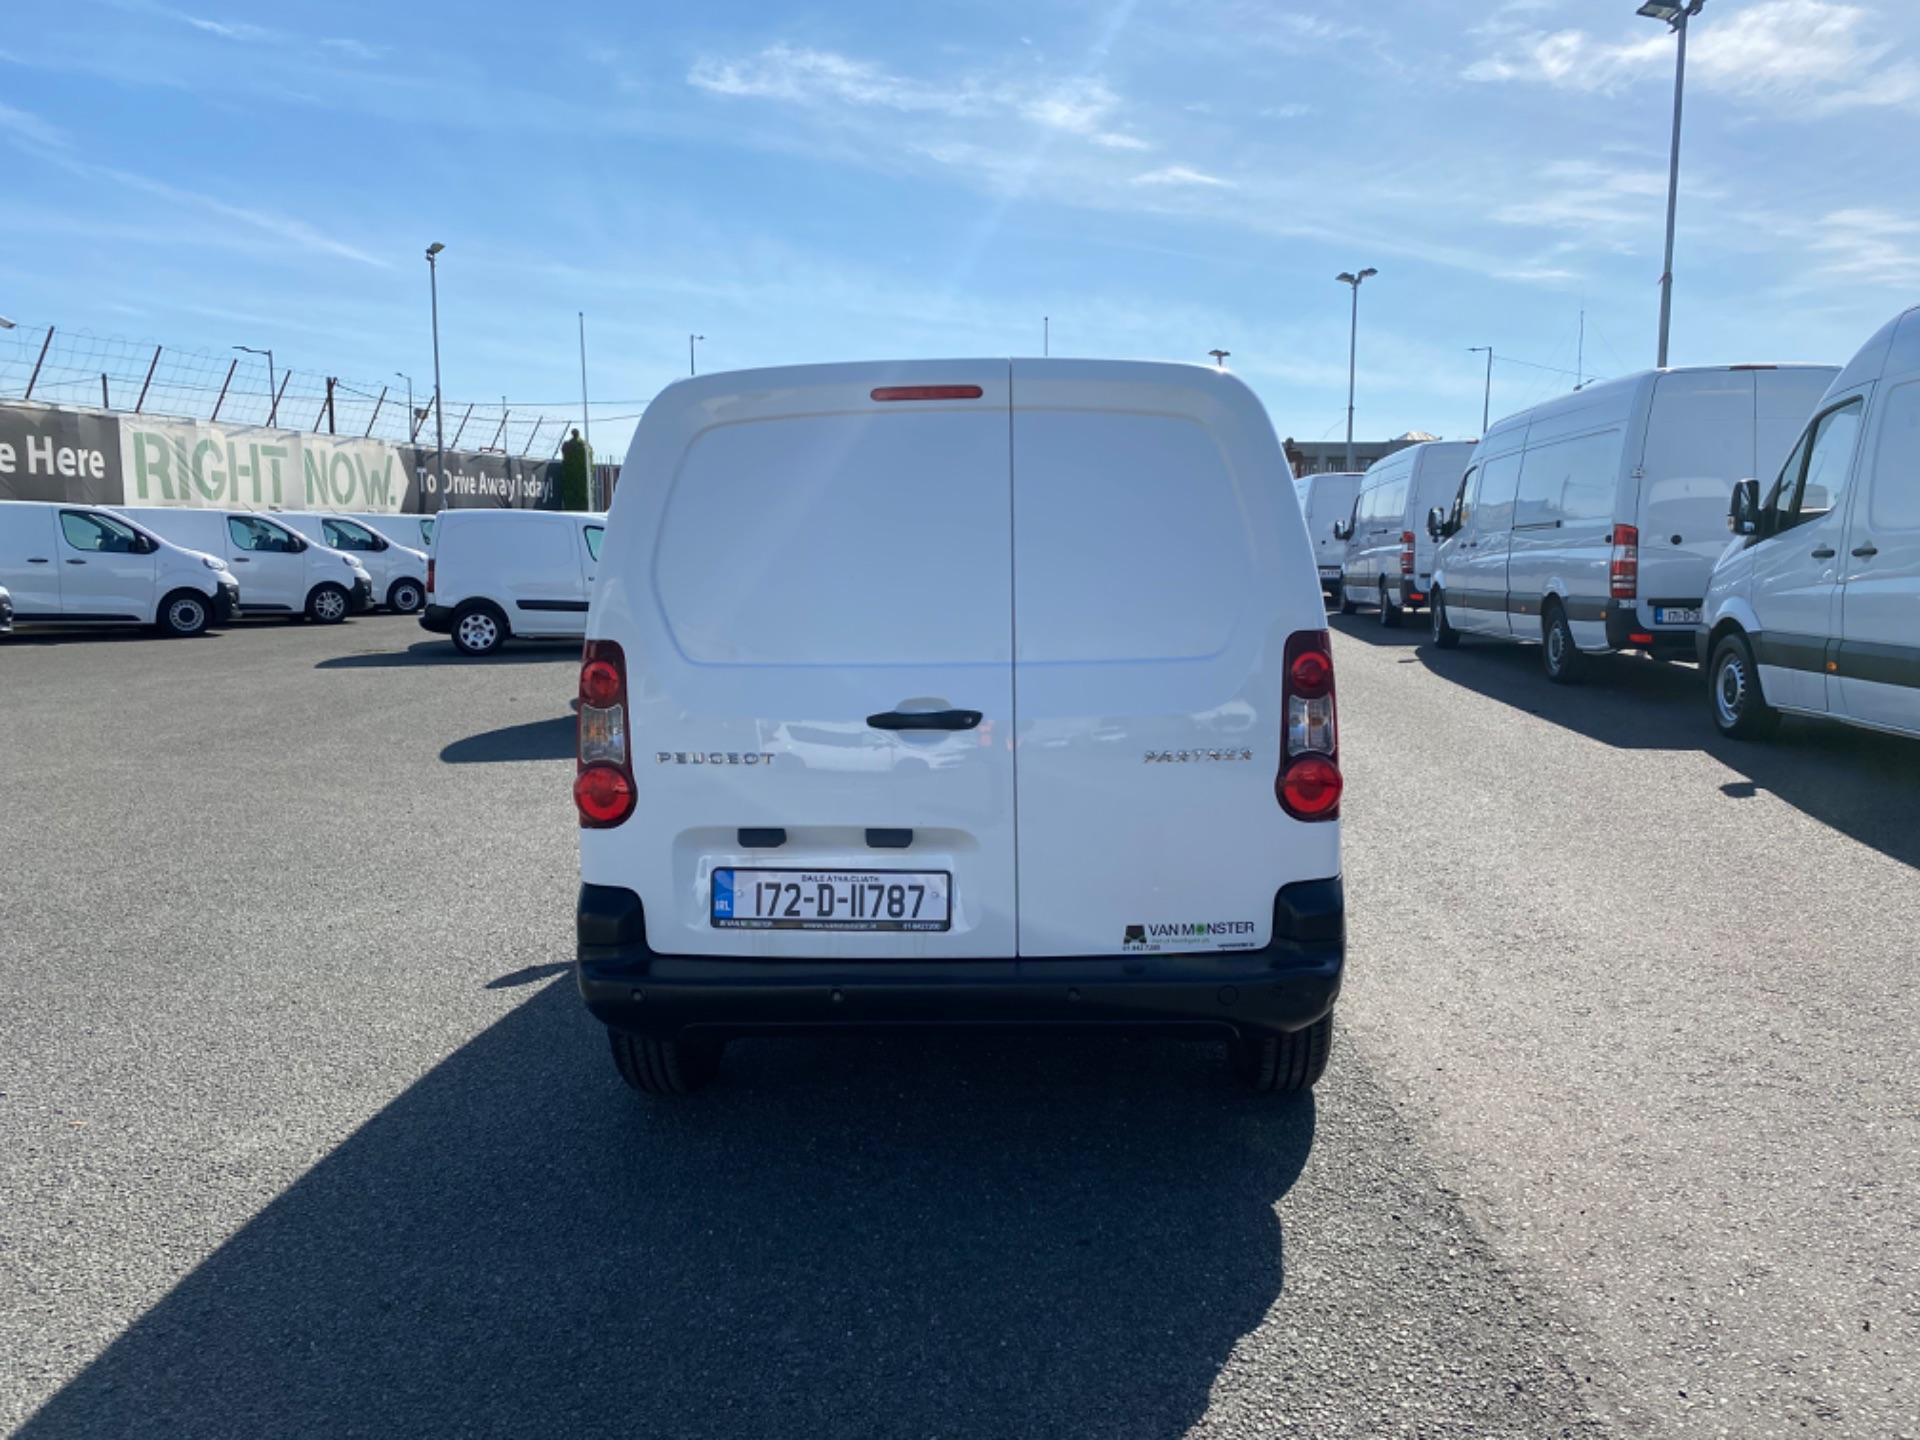 2017 Peugeot Partner Professional 1.6 Blue HDI 100 (172D11787) Image 6